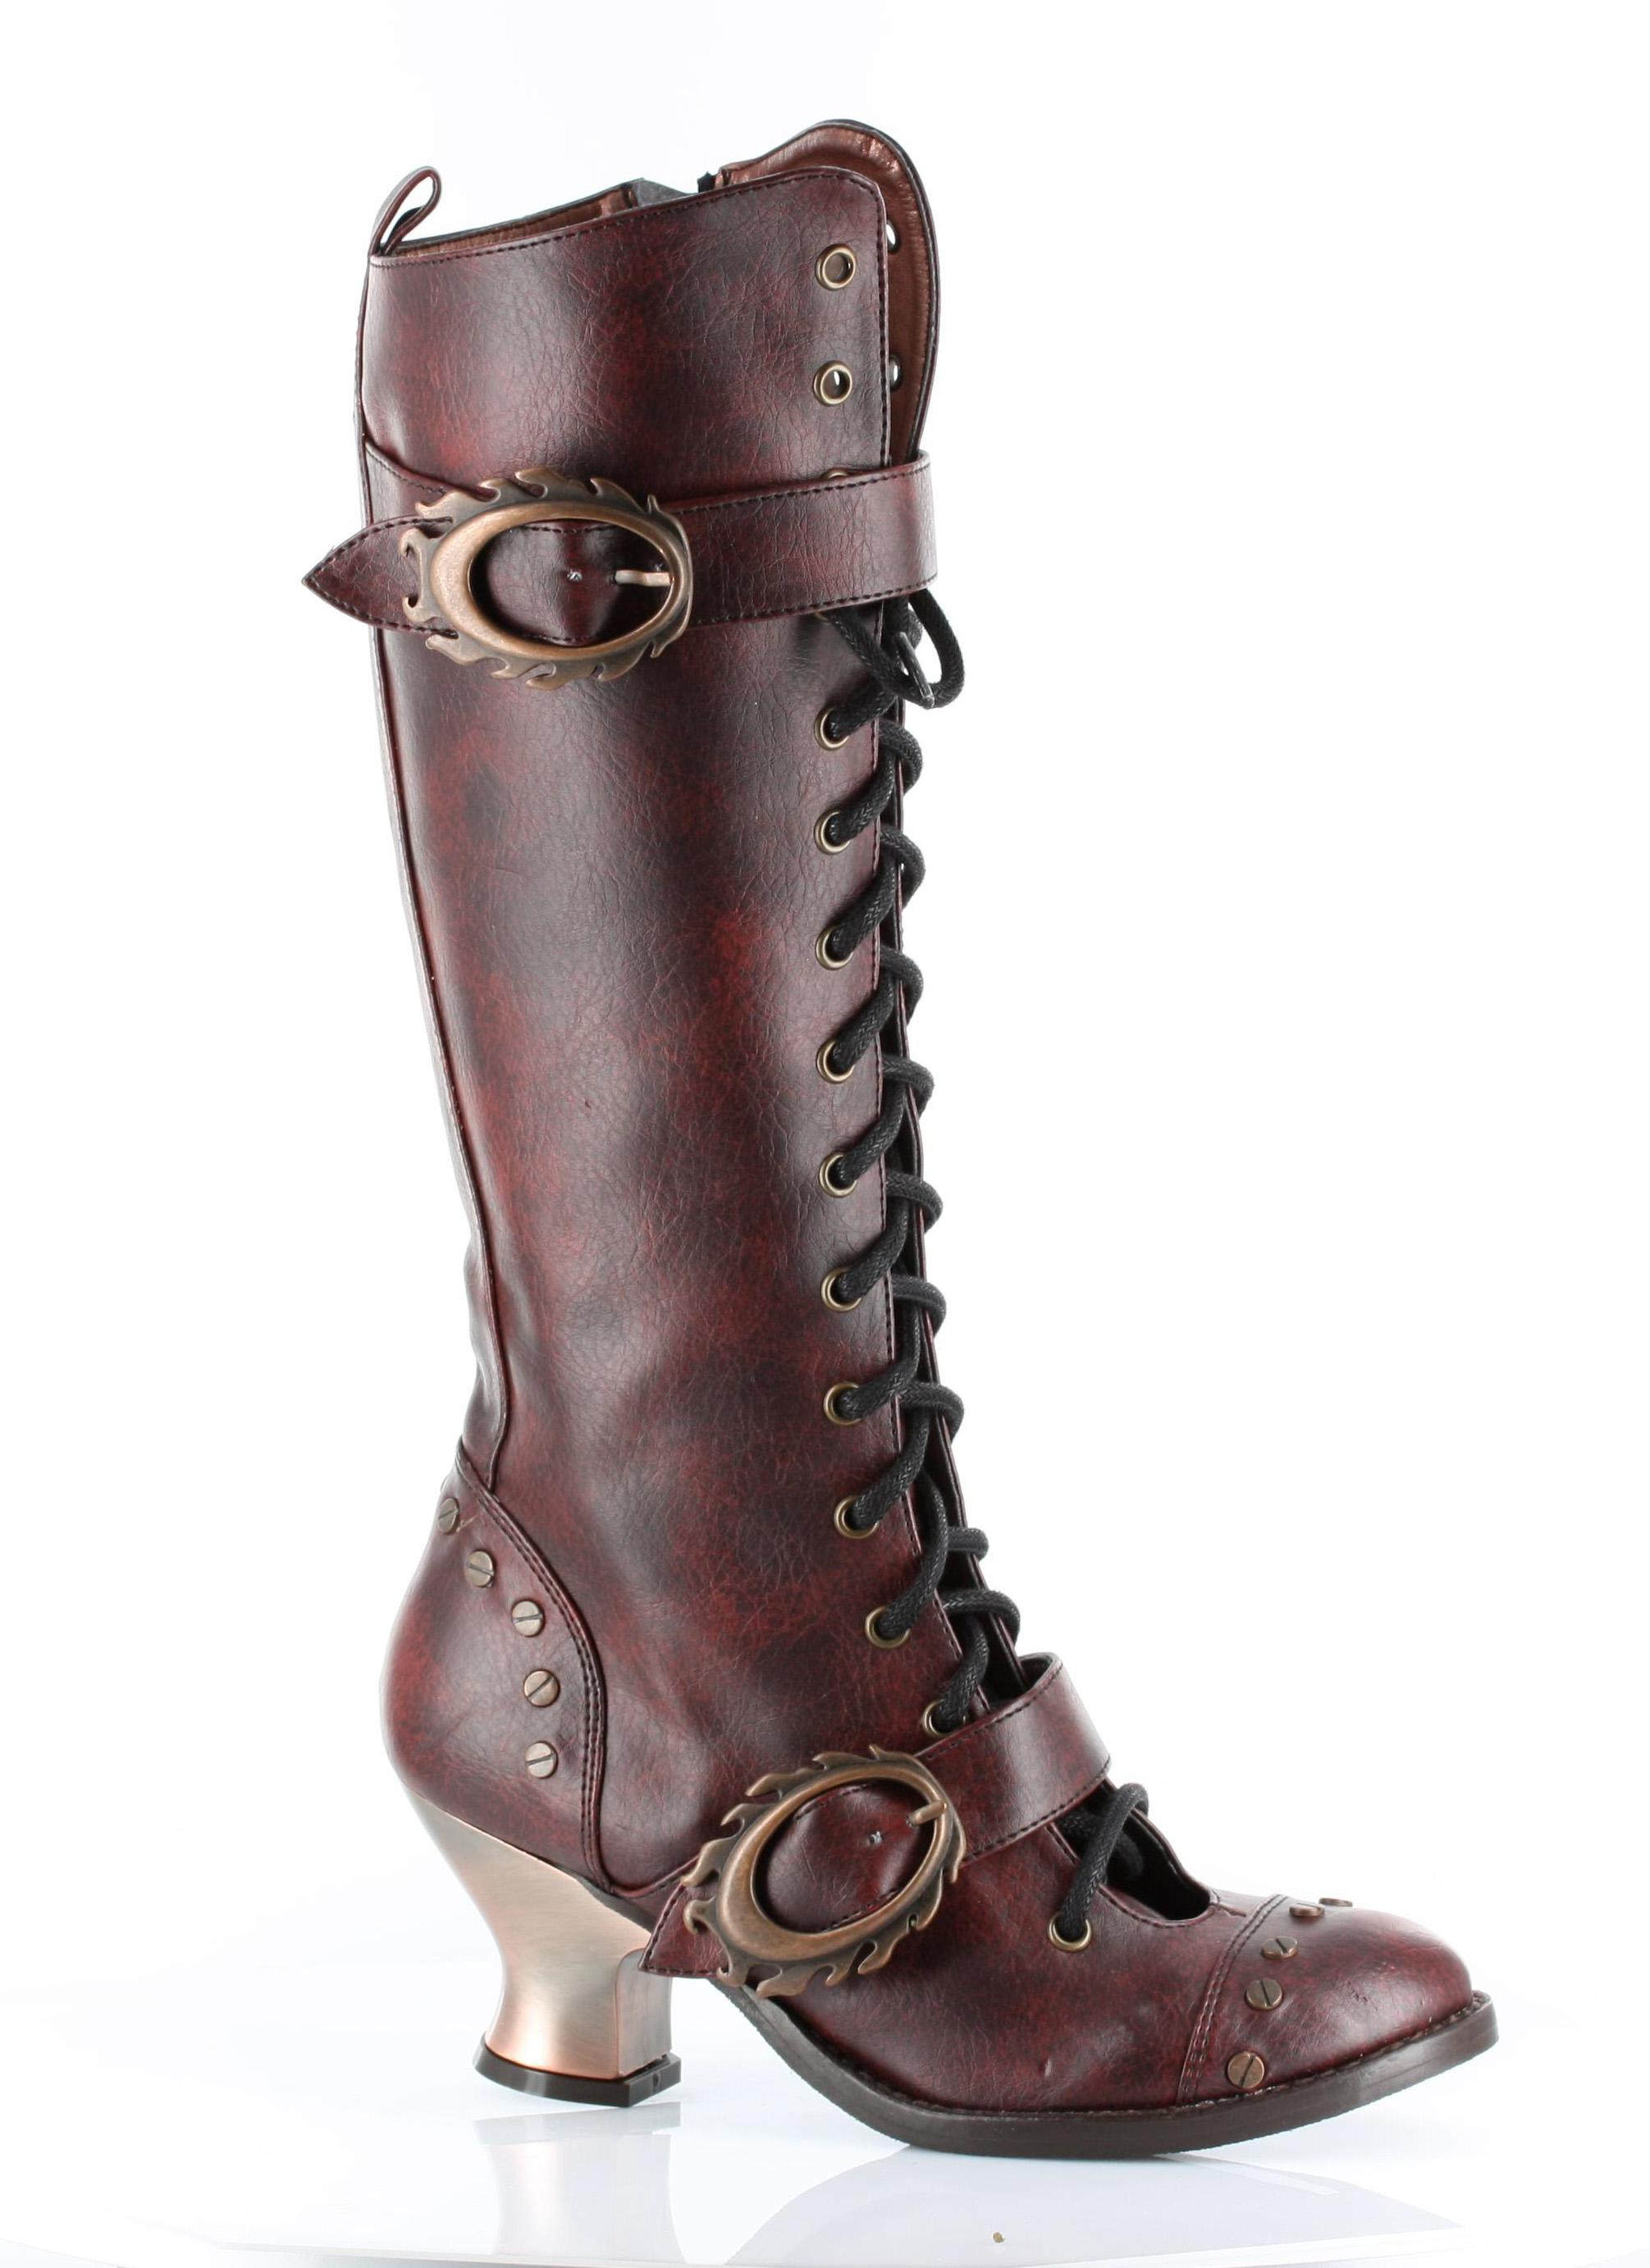 Best Women's Boots - Buy Stylish & Unique Women's Boots Online at